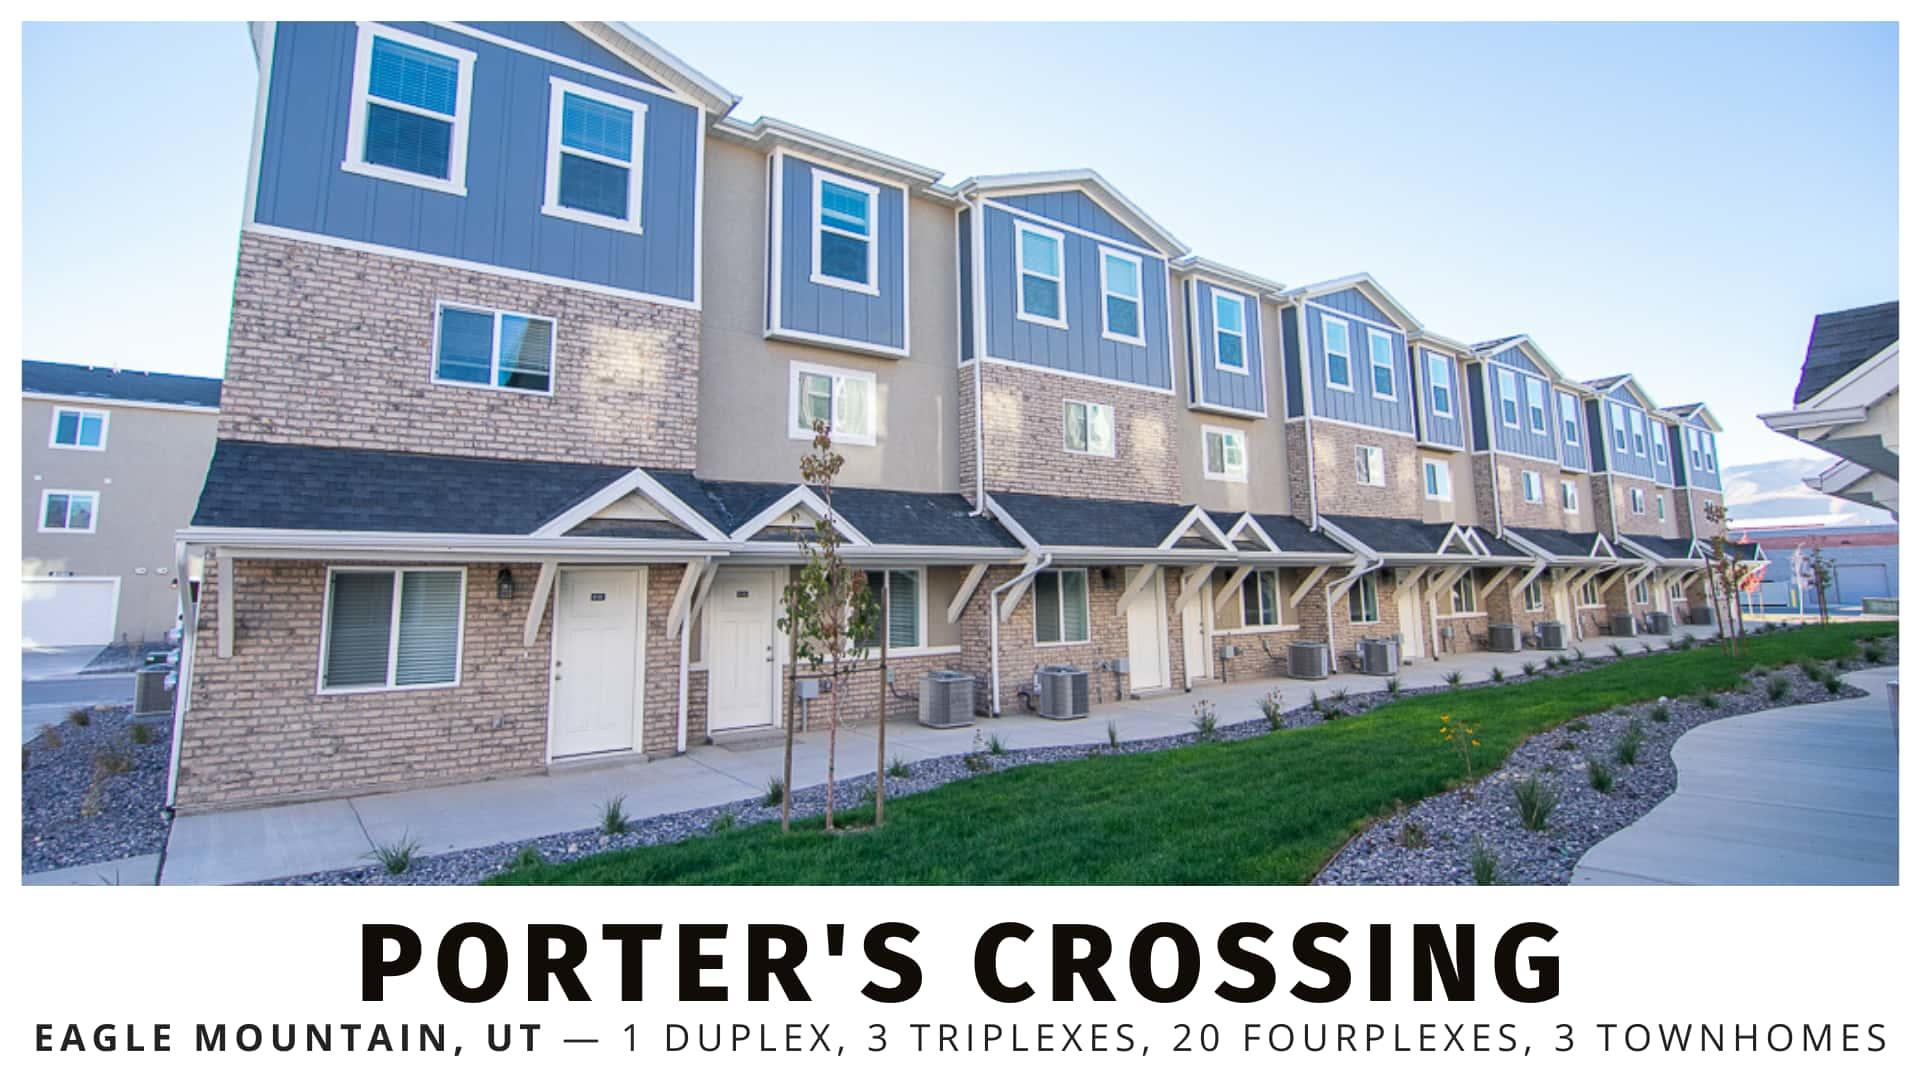 Porter's Crossing Duplex, Triplexes, and Fourplexes in Utah County